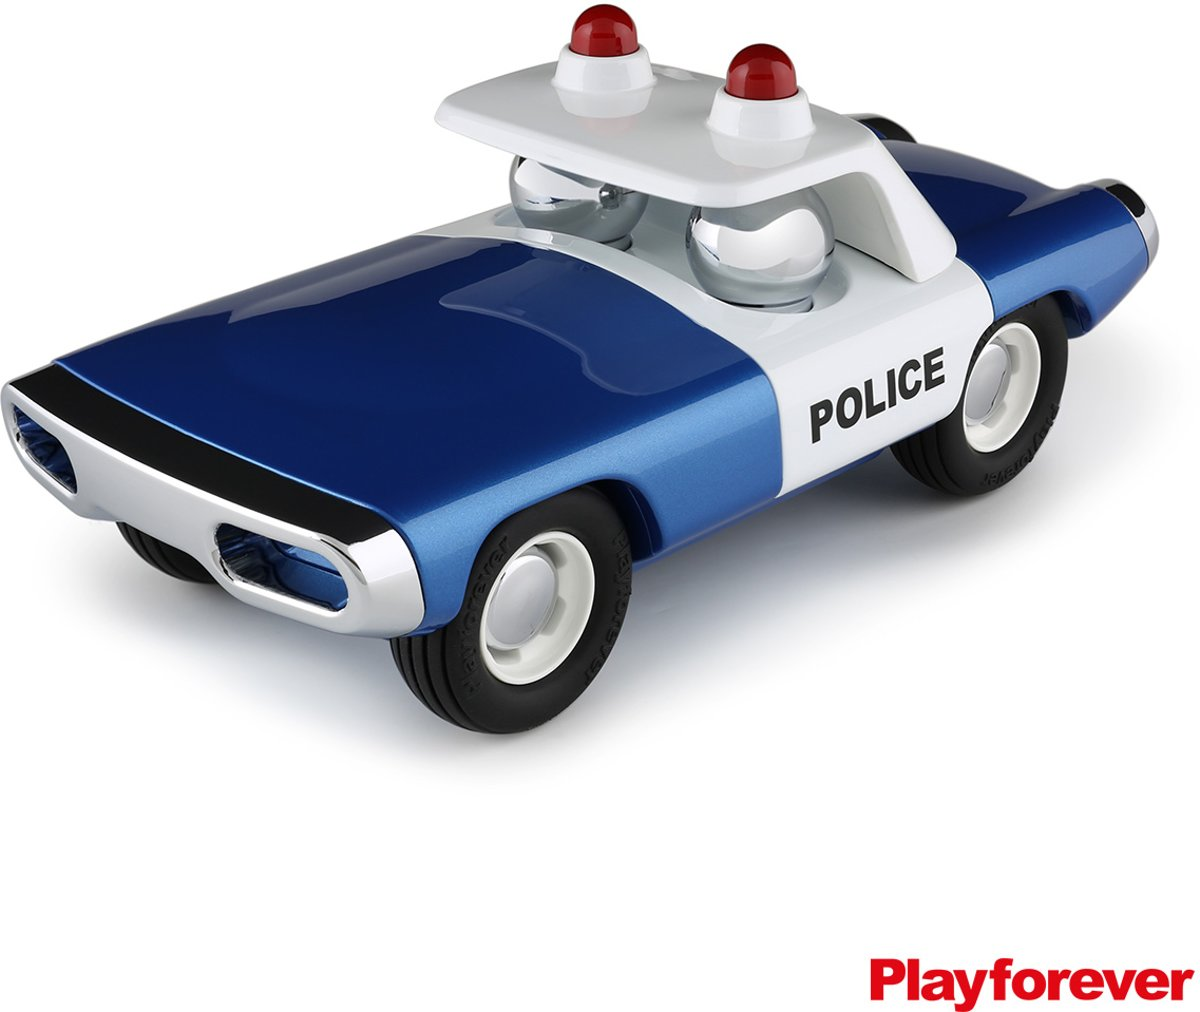 Playforever - Maverick Heat Police